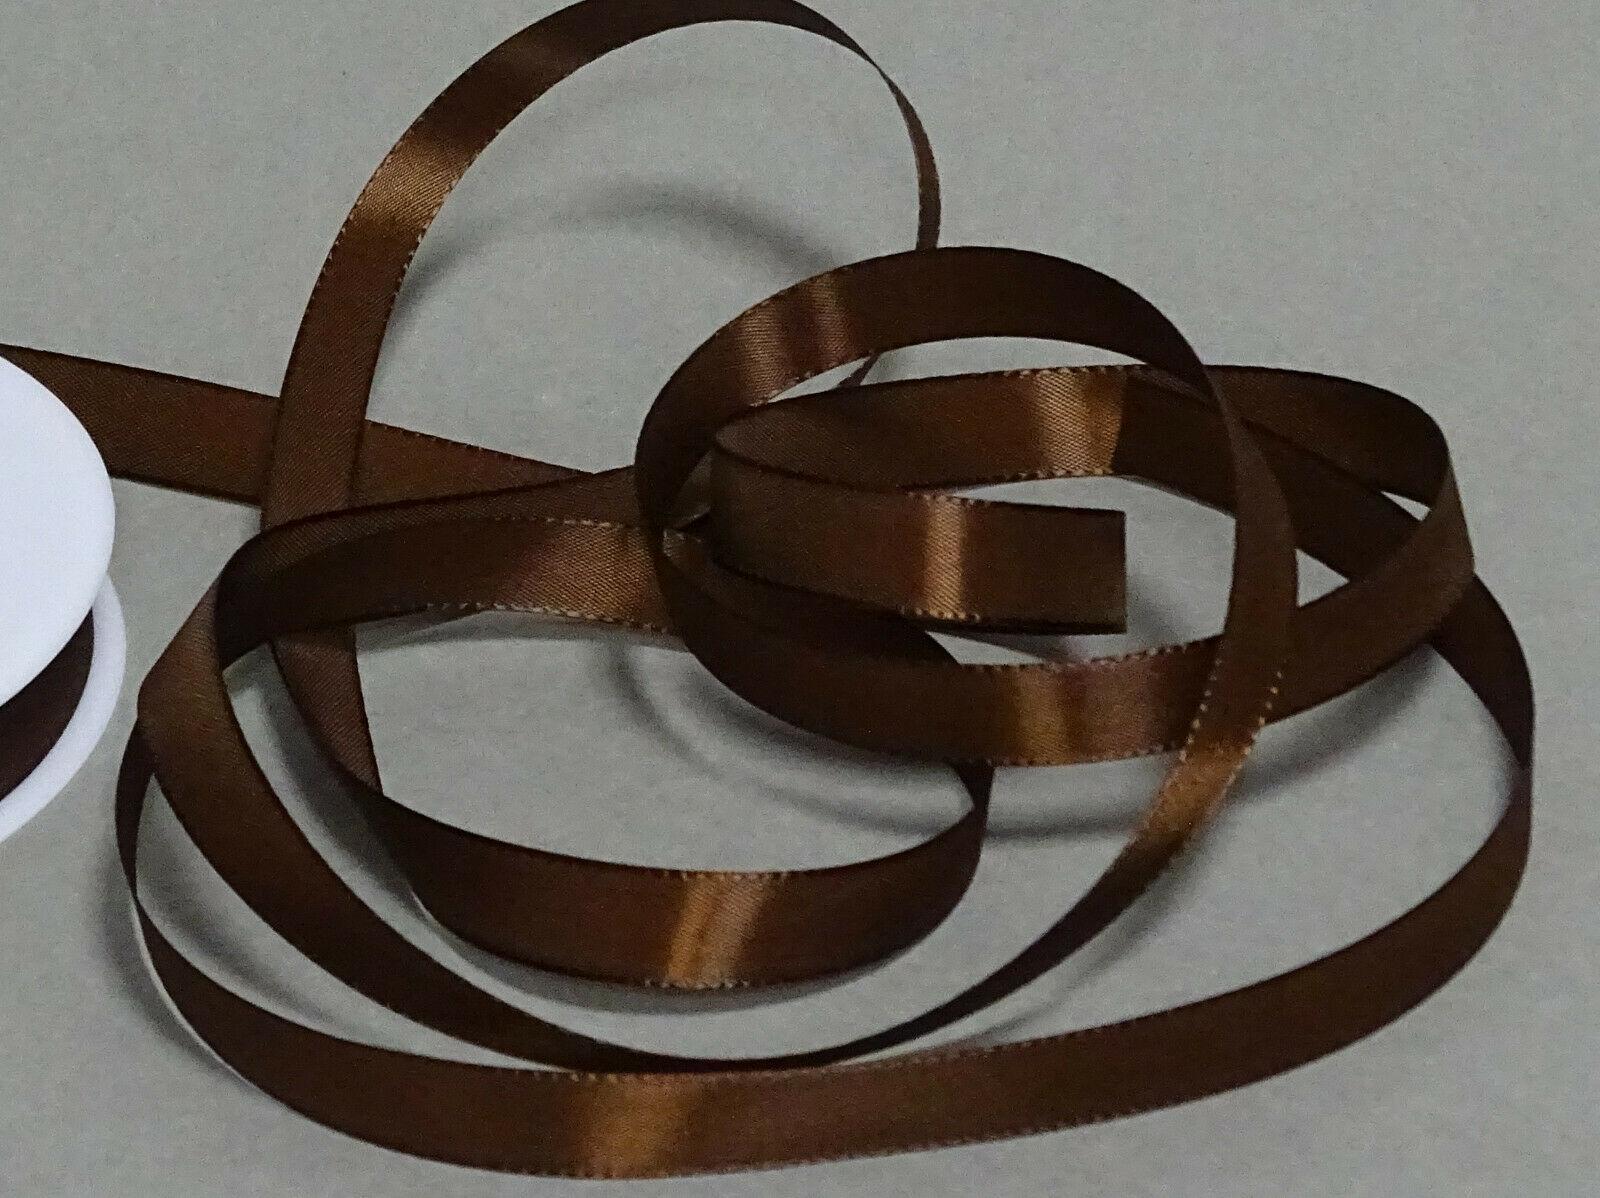 Seidenband Schleifenband 50 m x 15 mm / 40 mm Dekoband ab 0,08 €/m Geschenkband  - Braun 132, 15 mm x 50 m